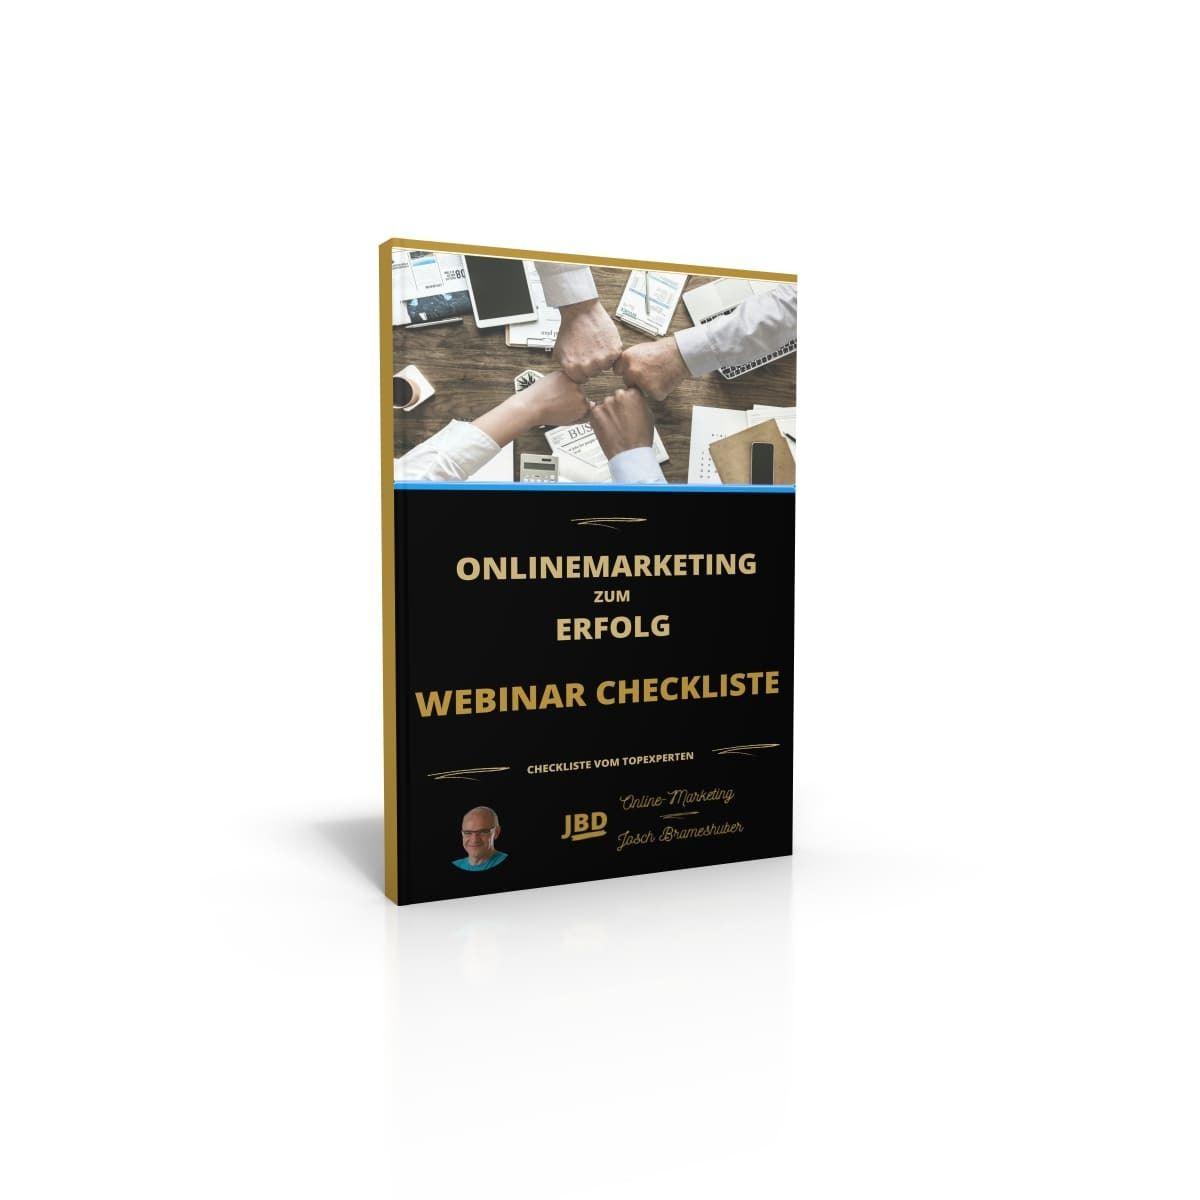 Cover Webinar CheckListe mit Foto